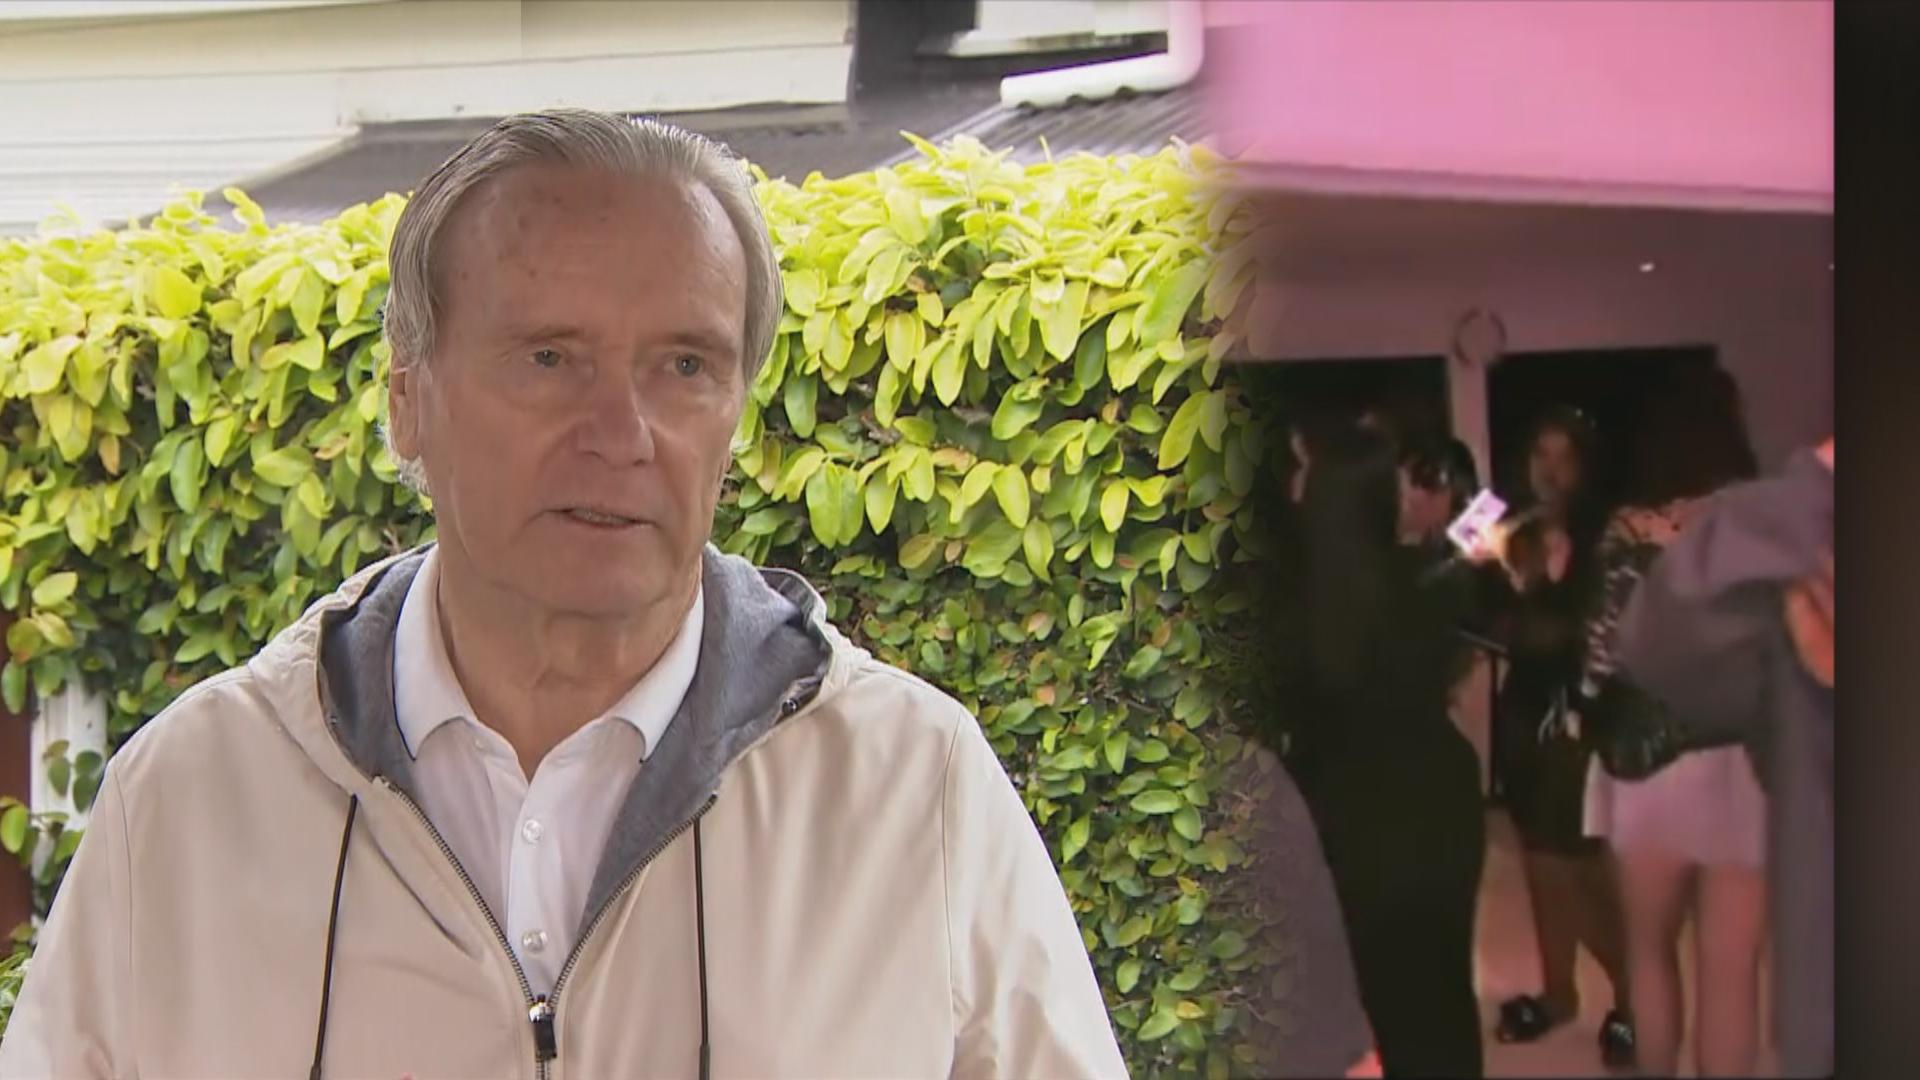 Auckland lockdown party perfect Delta breeding ground - expert